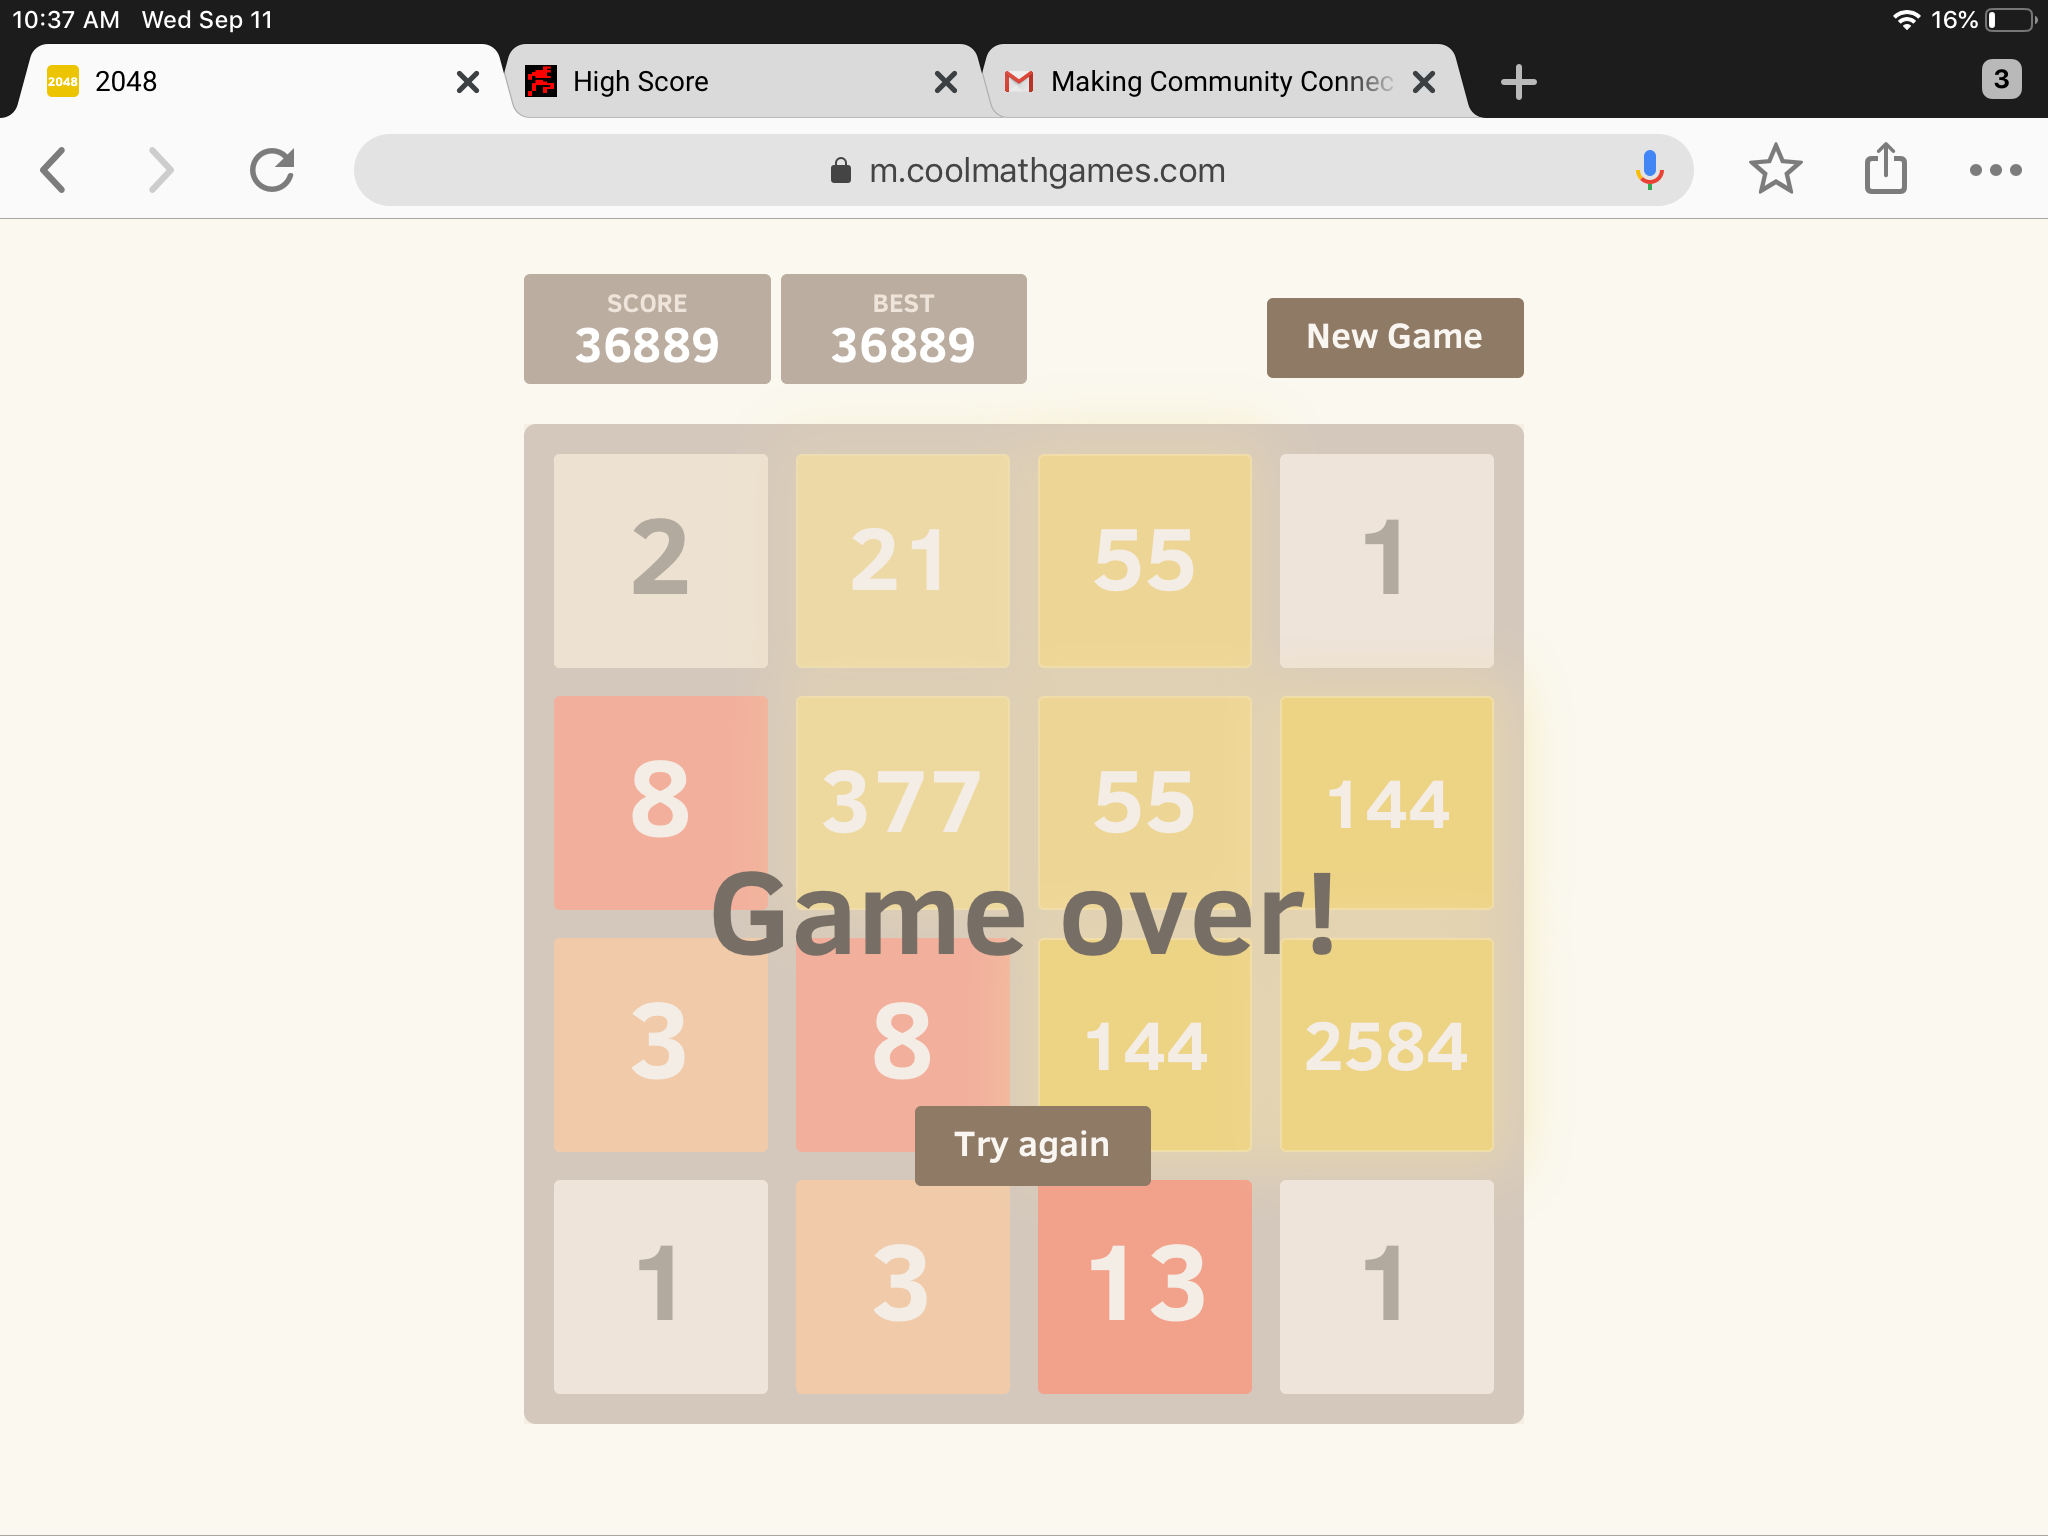 2048: Fibonacci 36,889 points